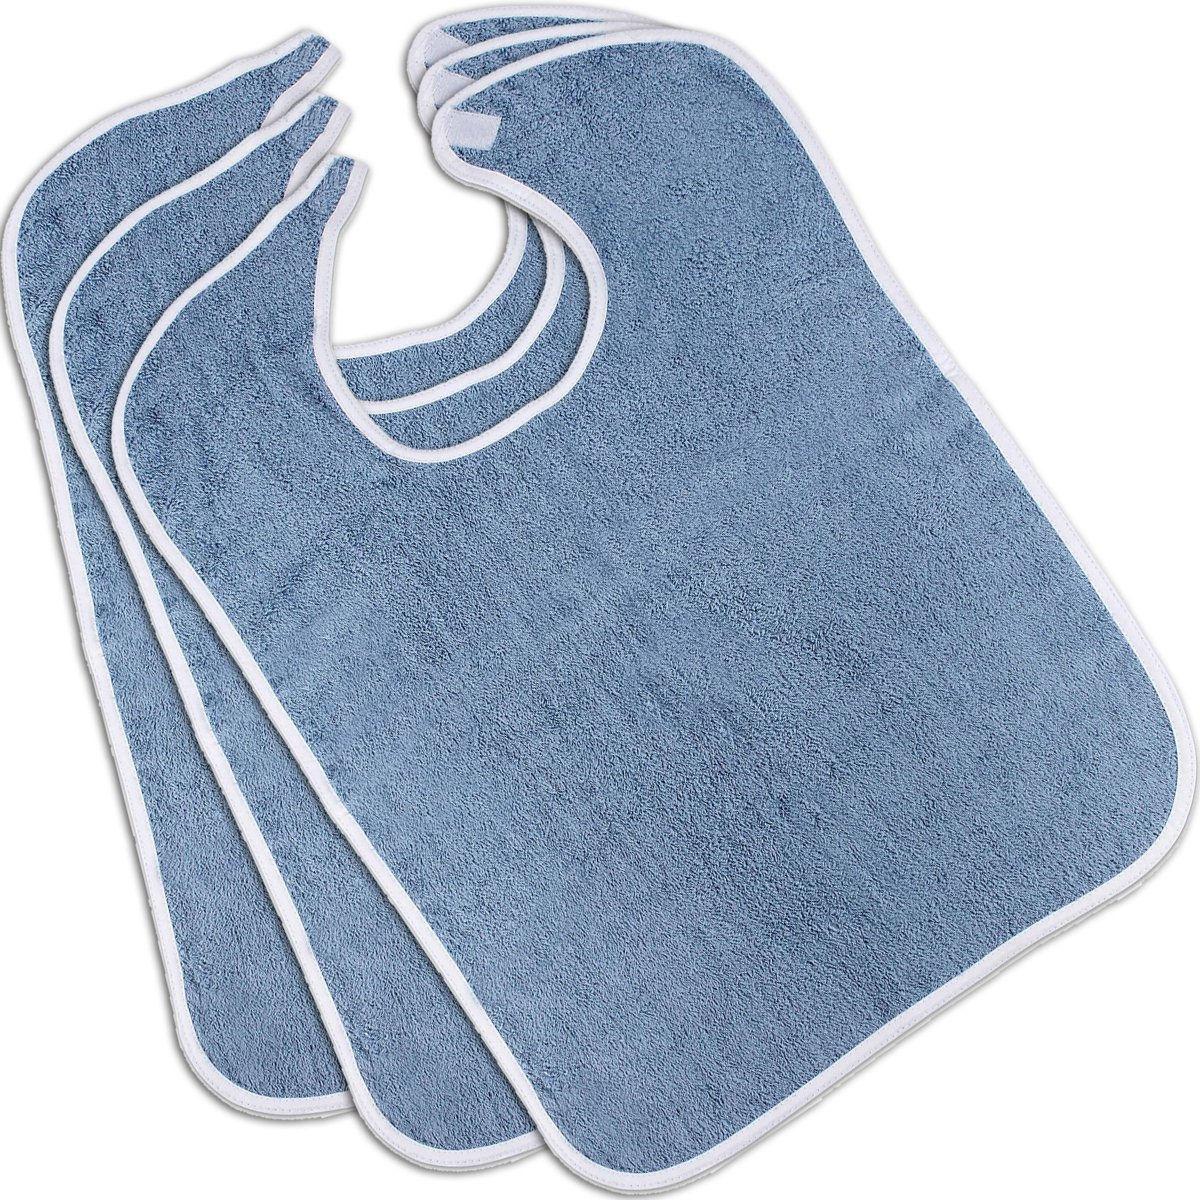 b31d29e0d Amazon.com  Utopia Towels Premium Quality Terry Adult Bibs (3-Pack ...